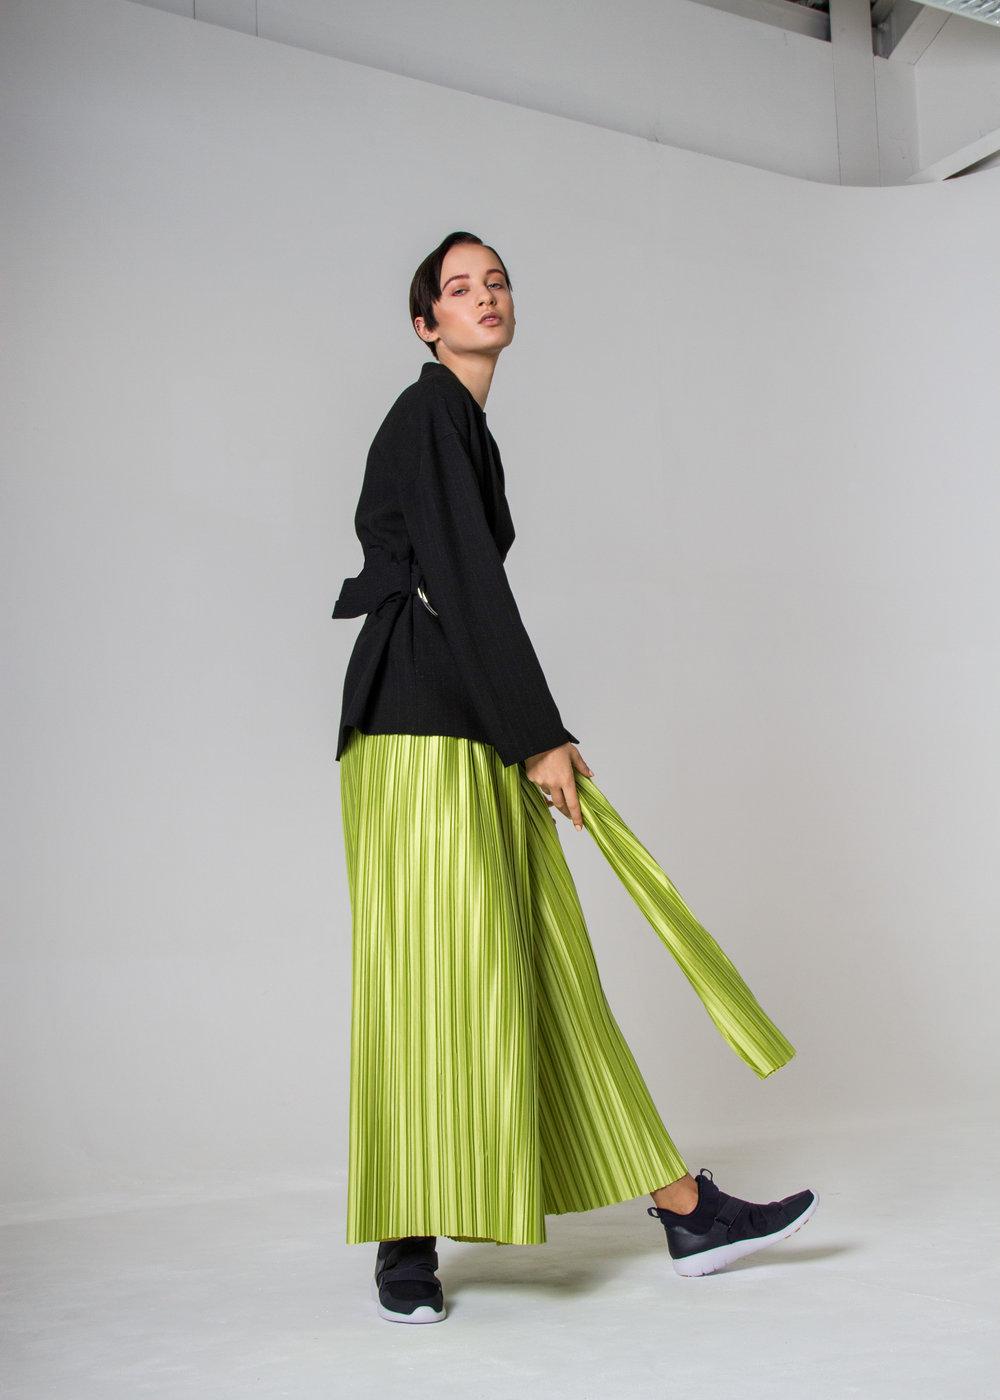 trousers MAGDALENA CZARNIECKA, blazer ZARA, shoes H&M